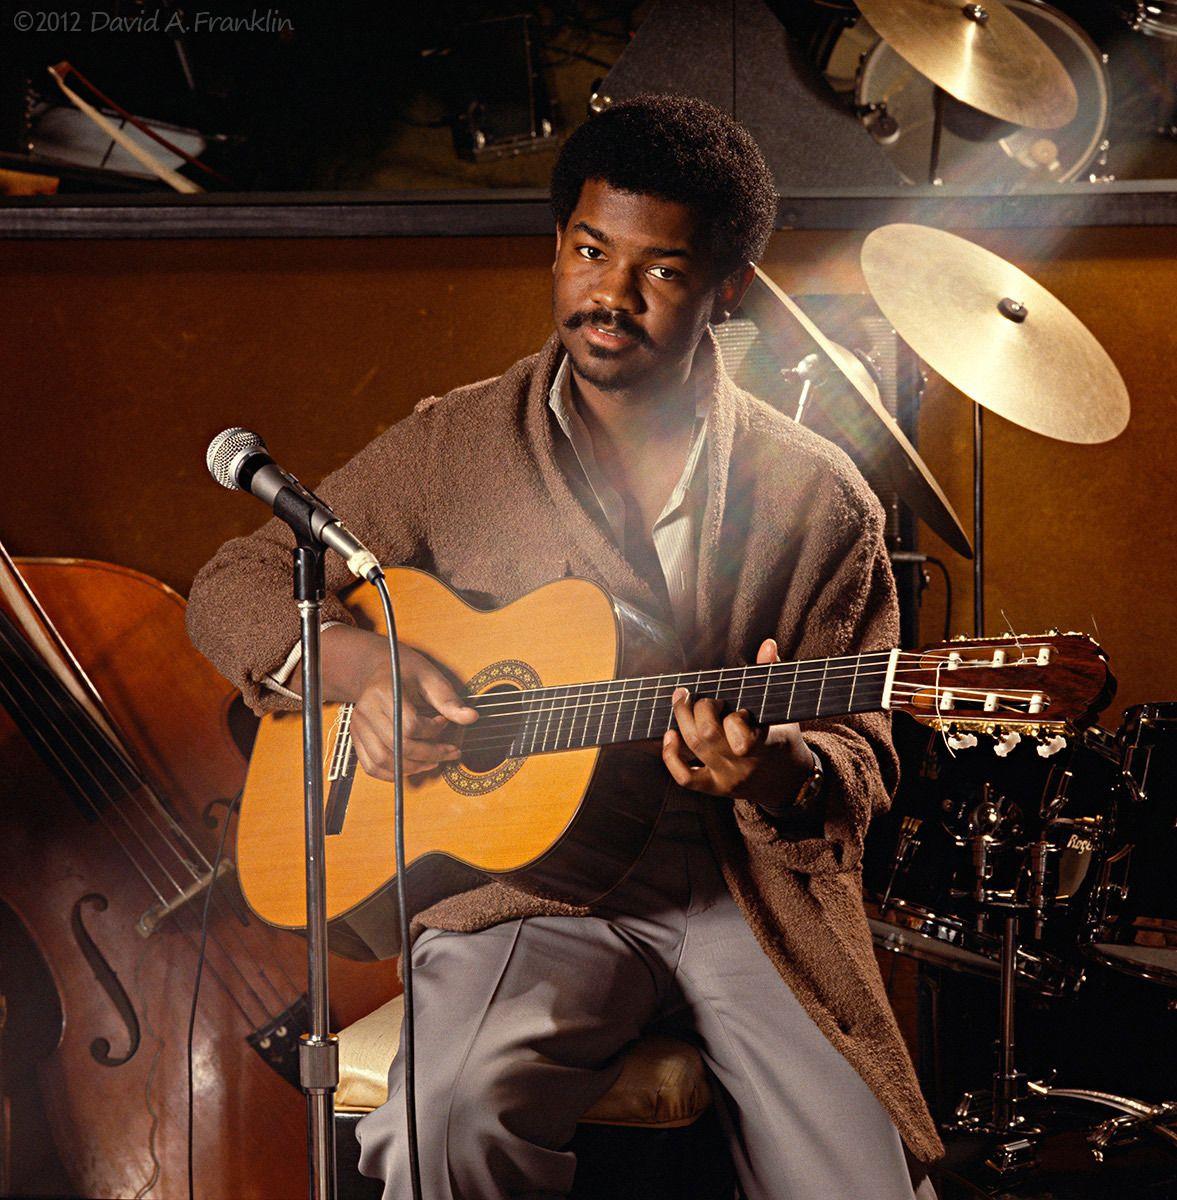 EarlKlugh_JazzGuitarArtist_BakersKeyboardLounge_Detroit_HometownRoots_Editorial